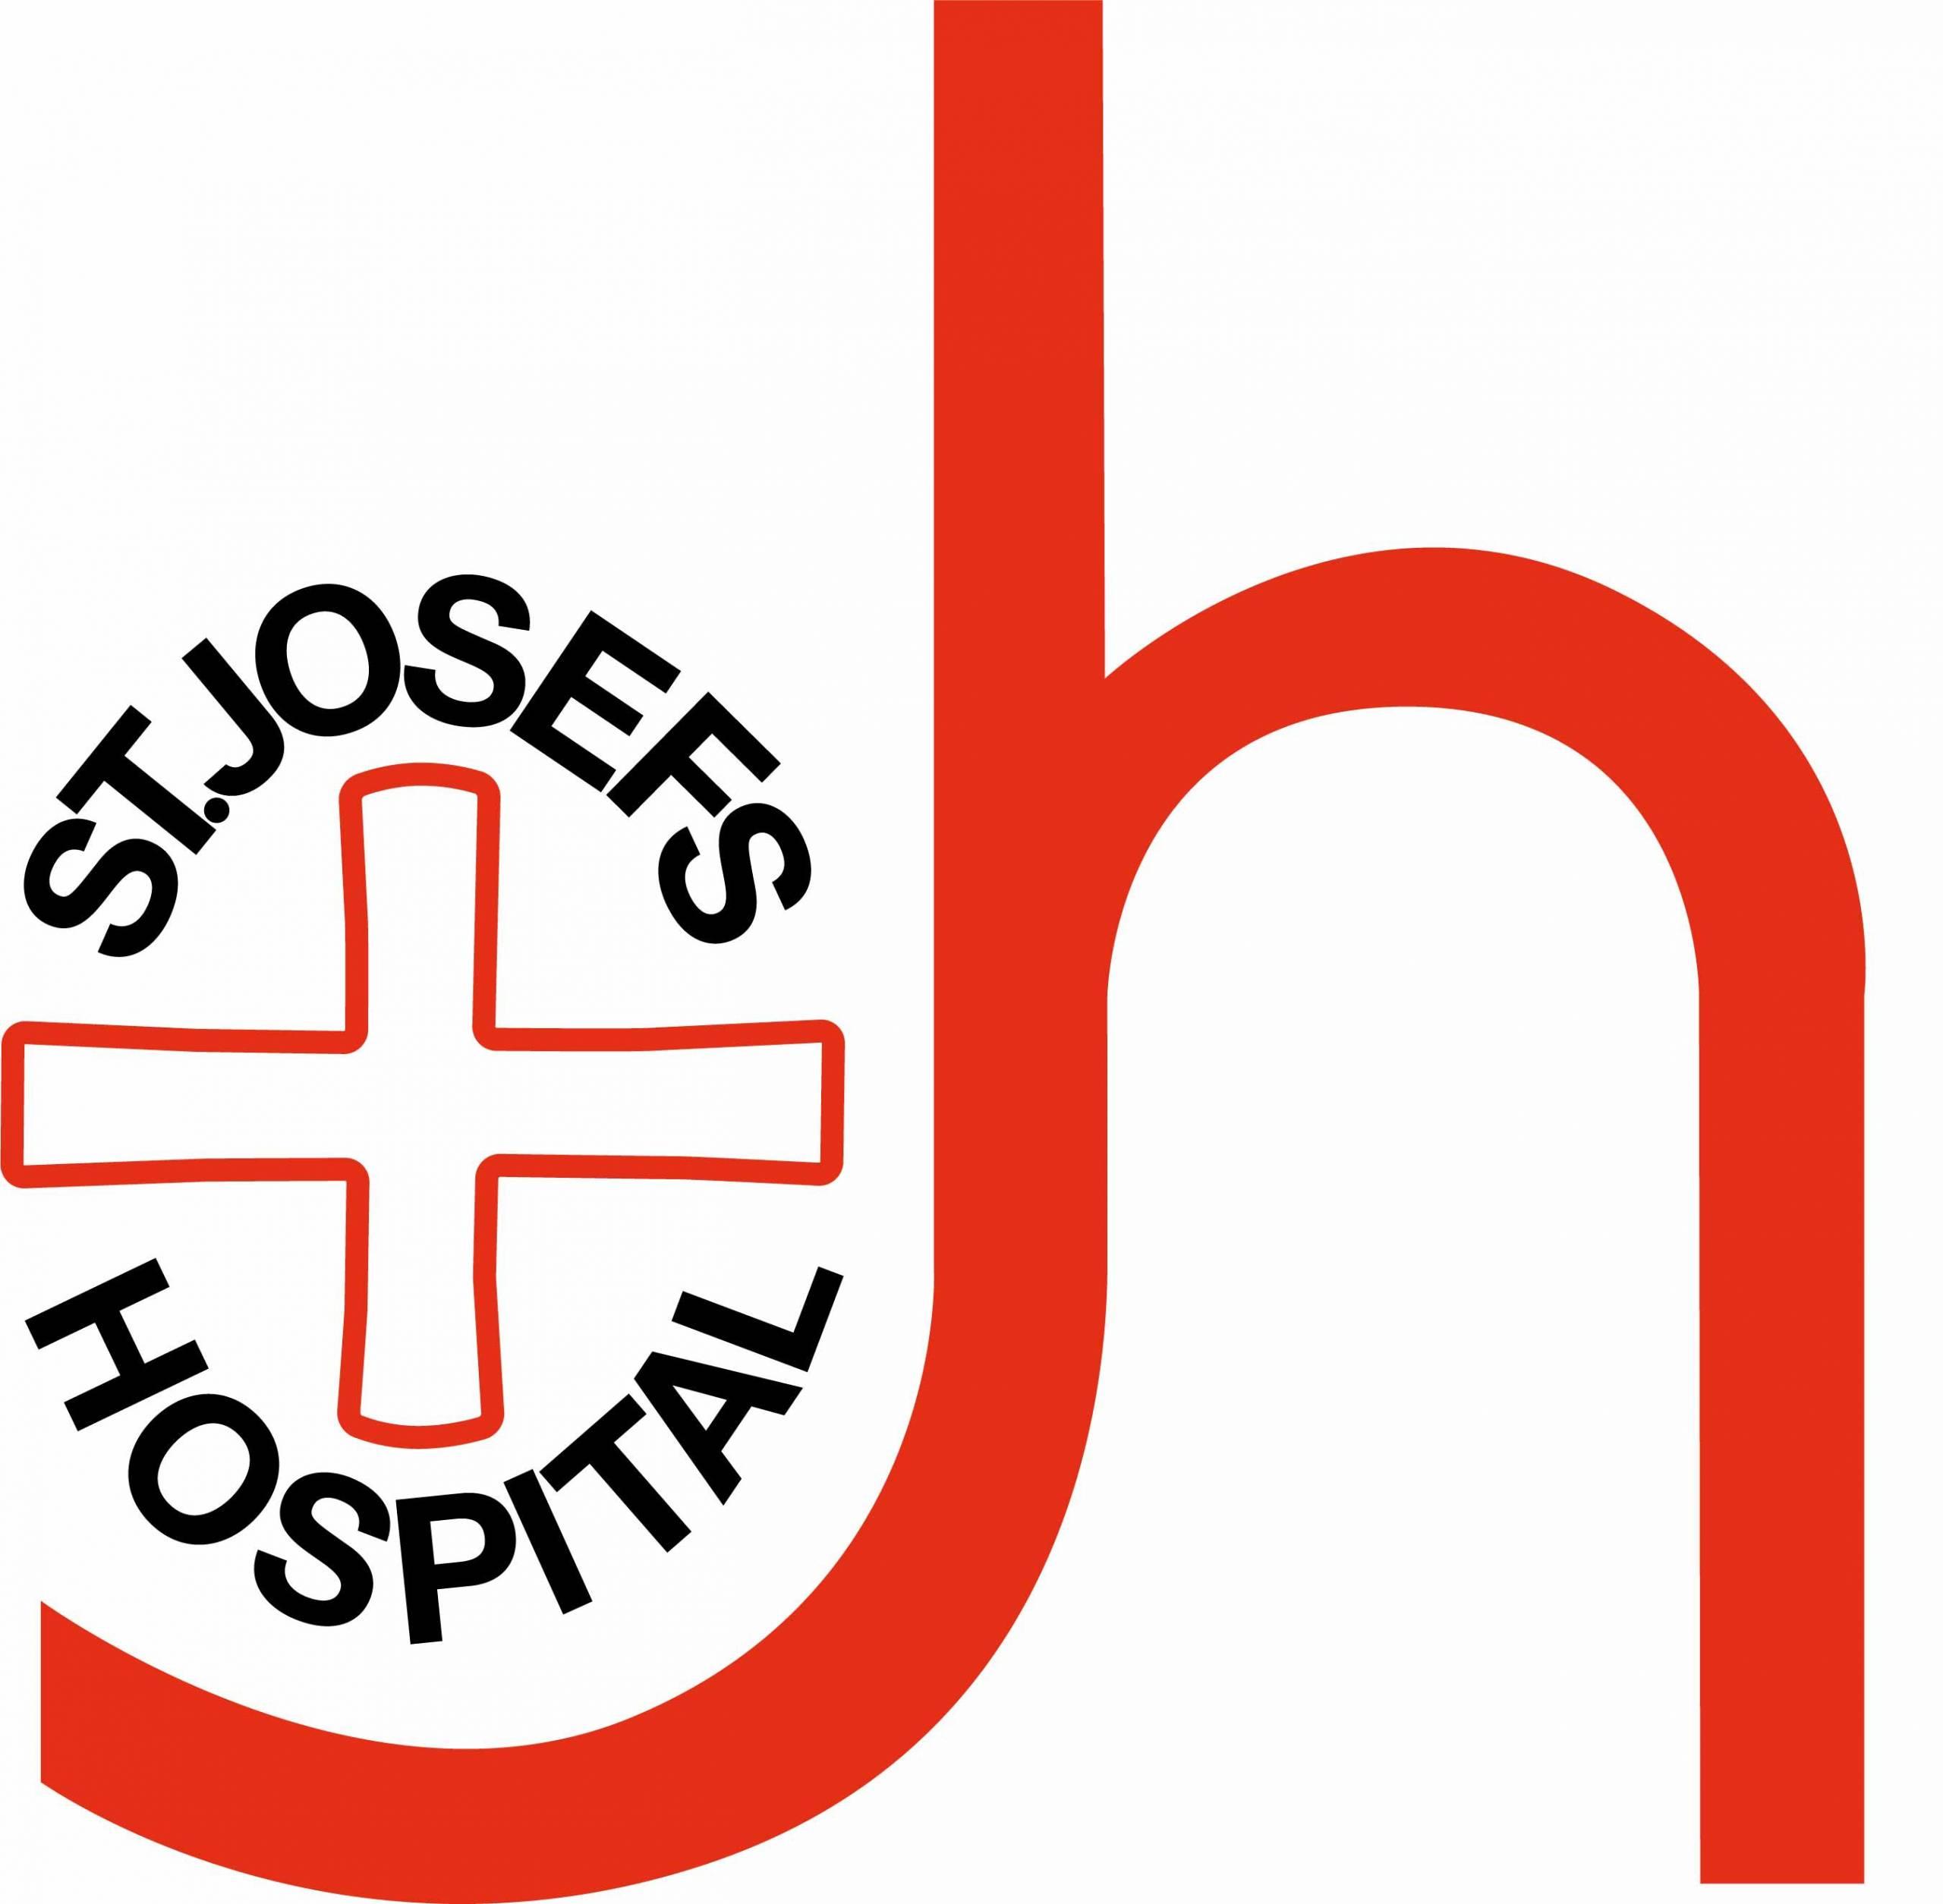 St Josepfs Hospital